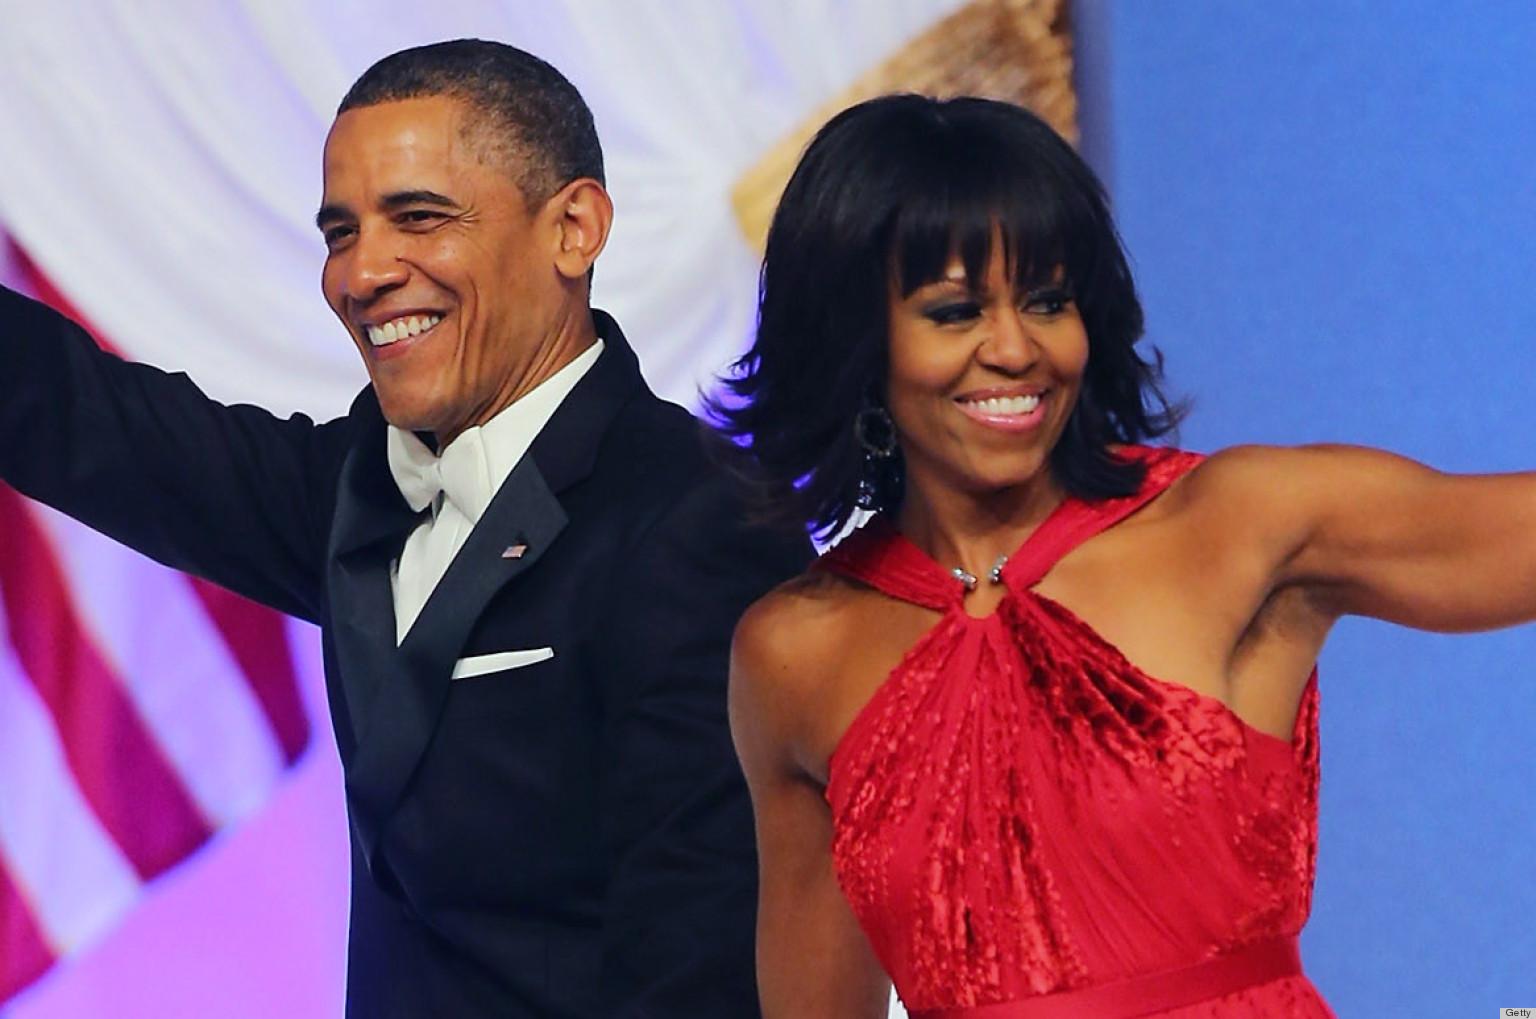 Michelle Obama Dress At The Inauguration Ball 2013: Jason Wu Red ...